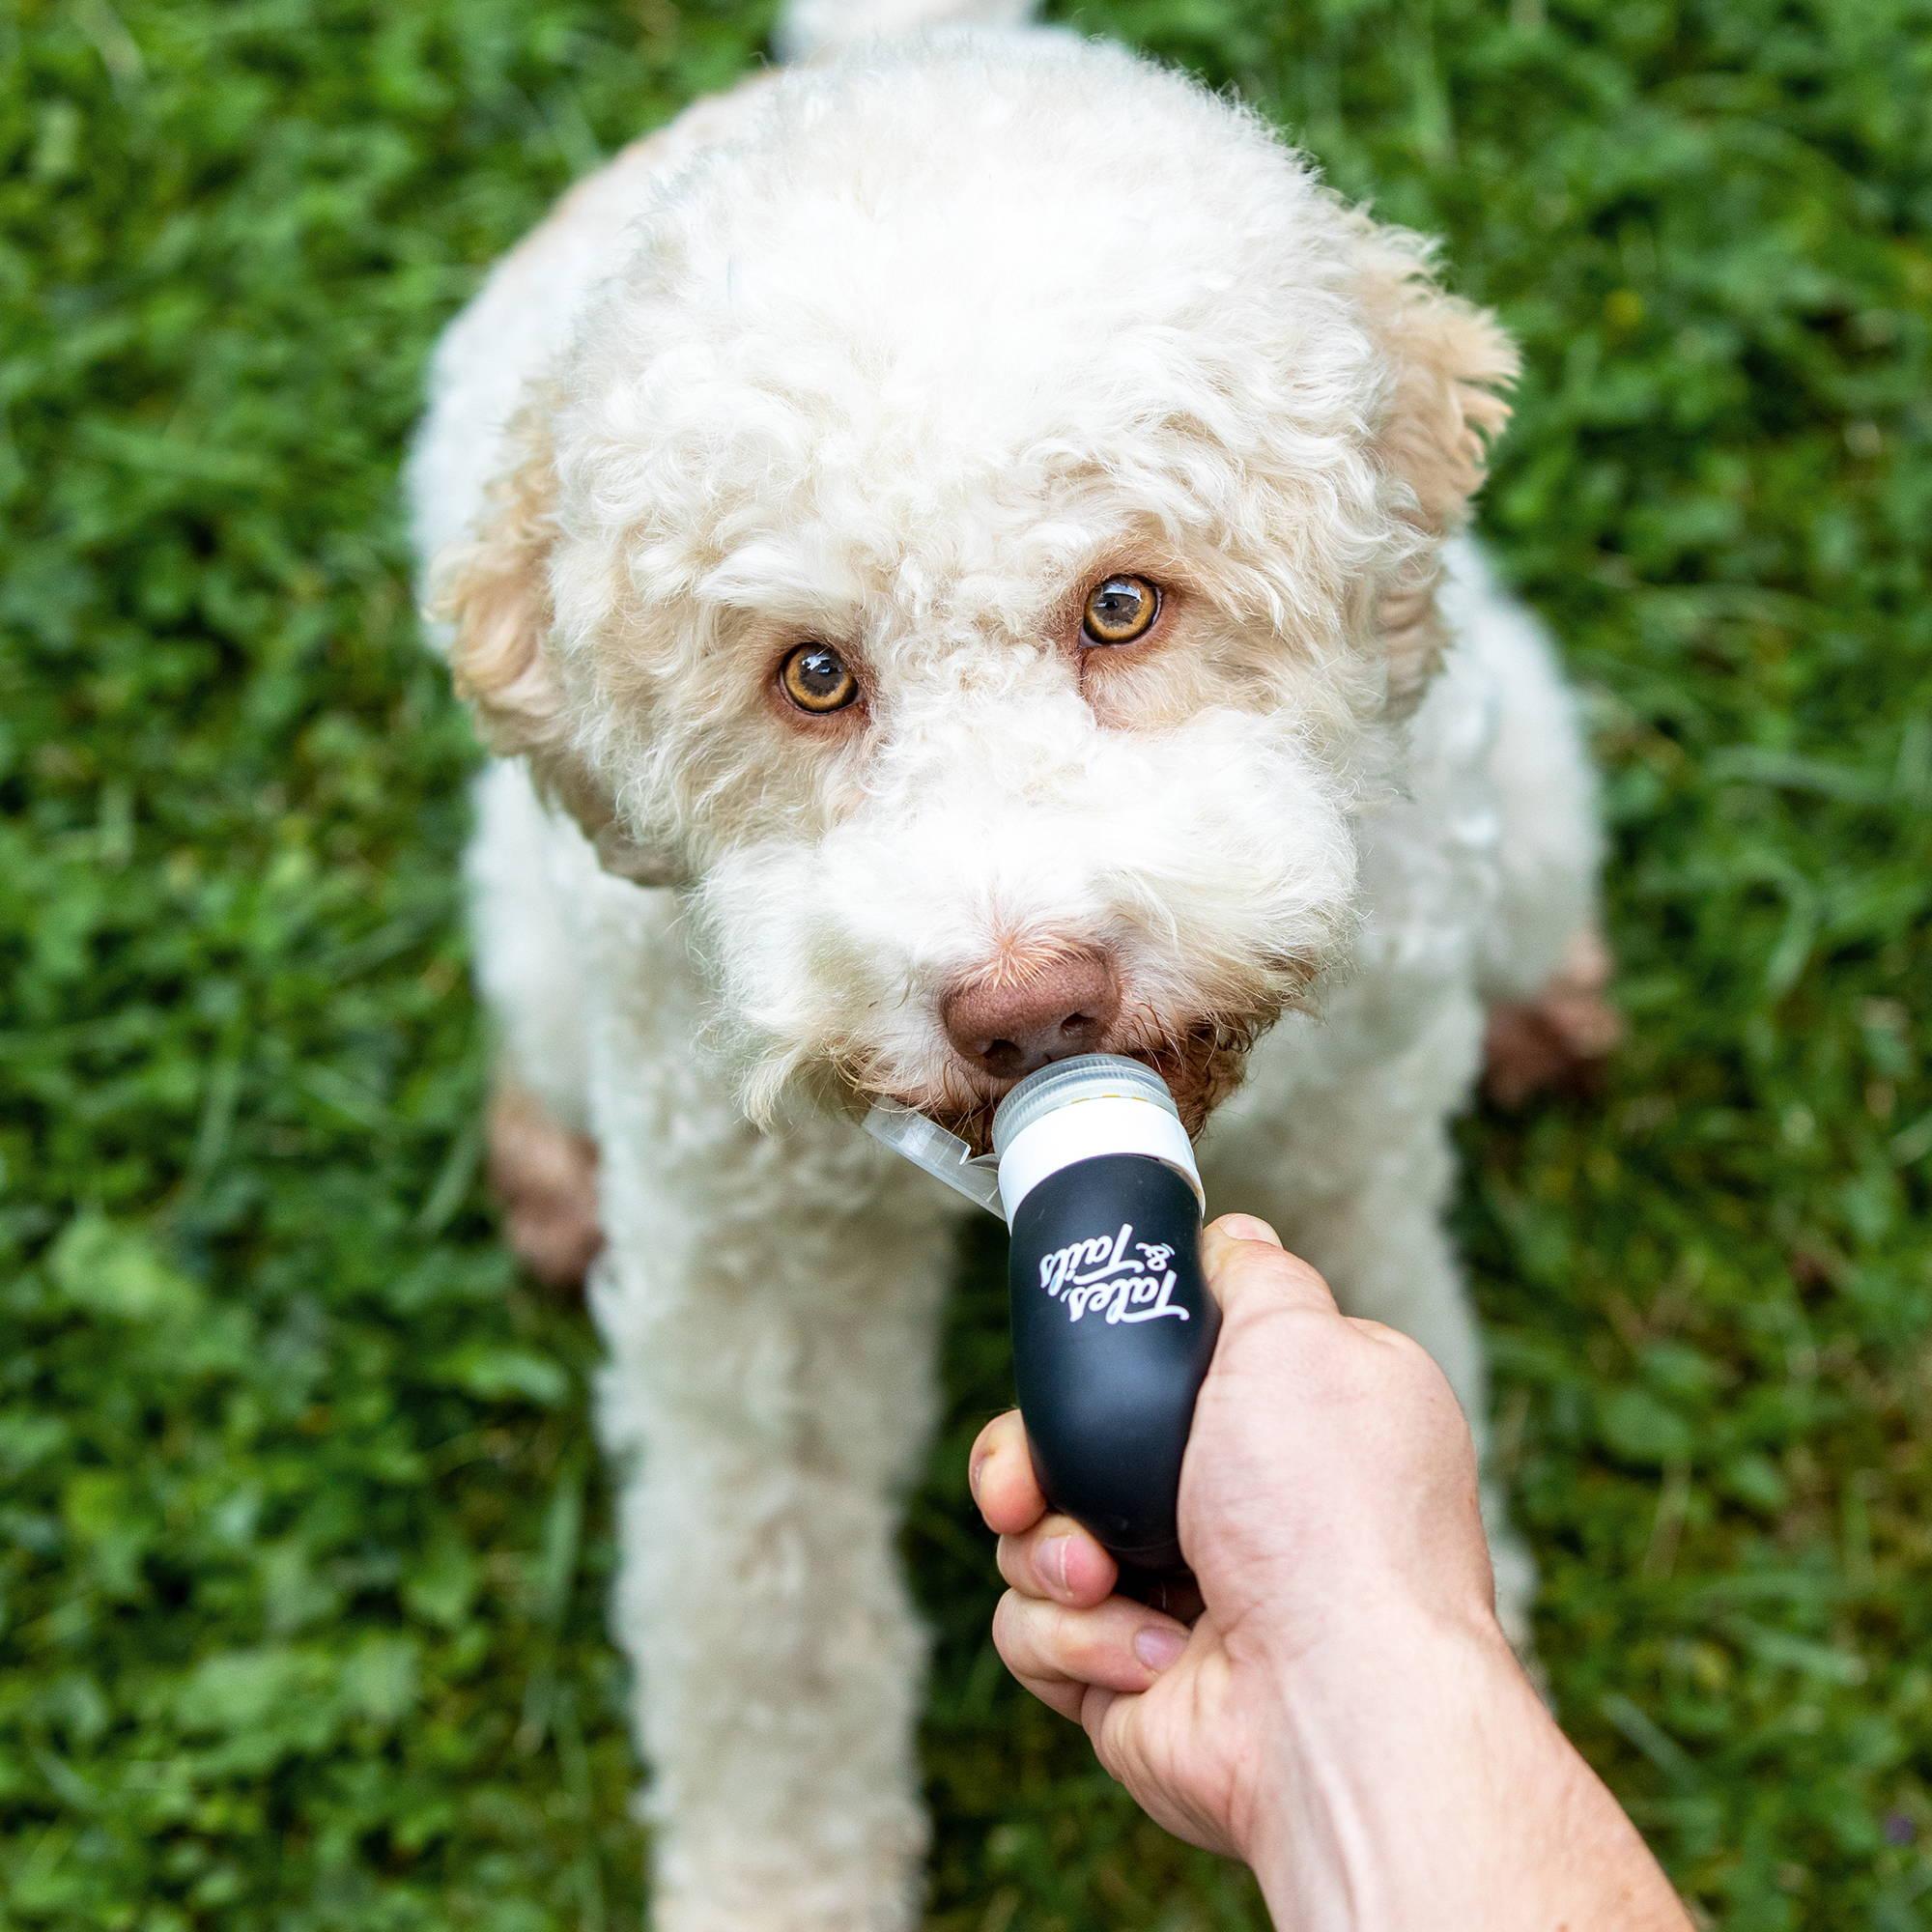 Futtertube für Hunde im Training